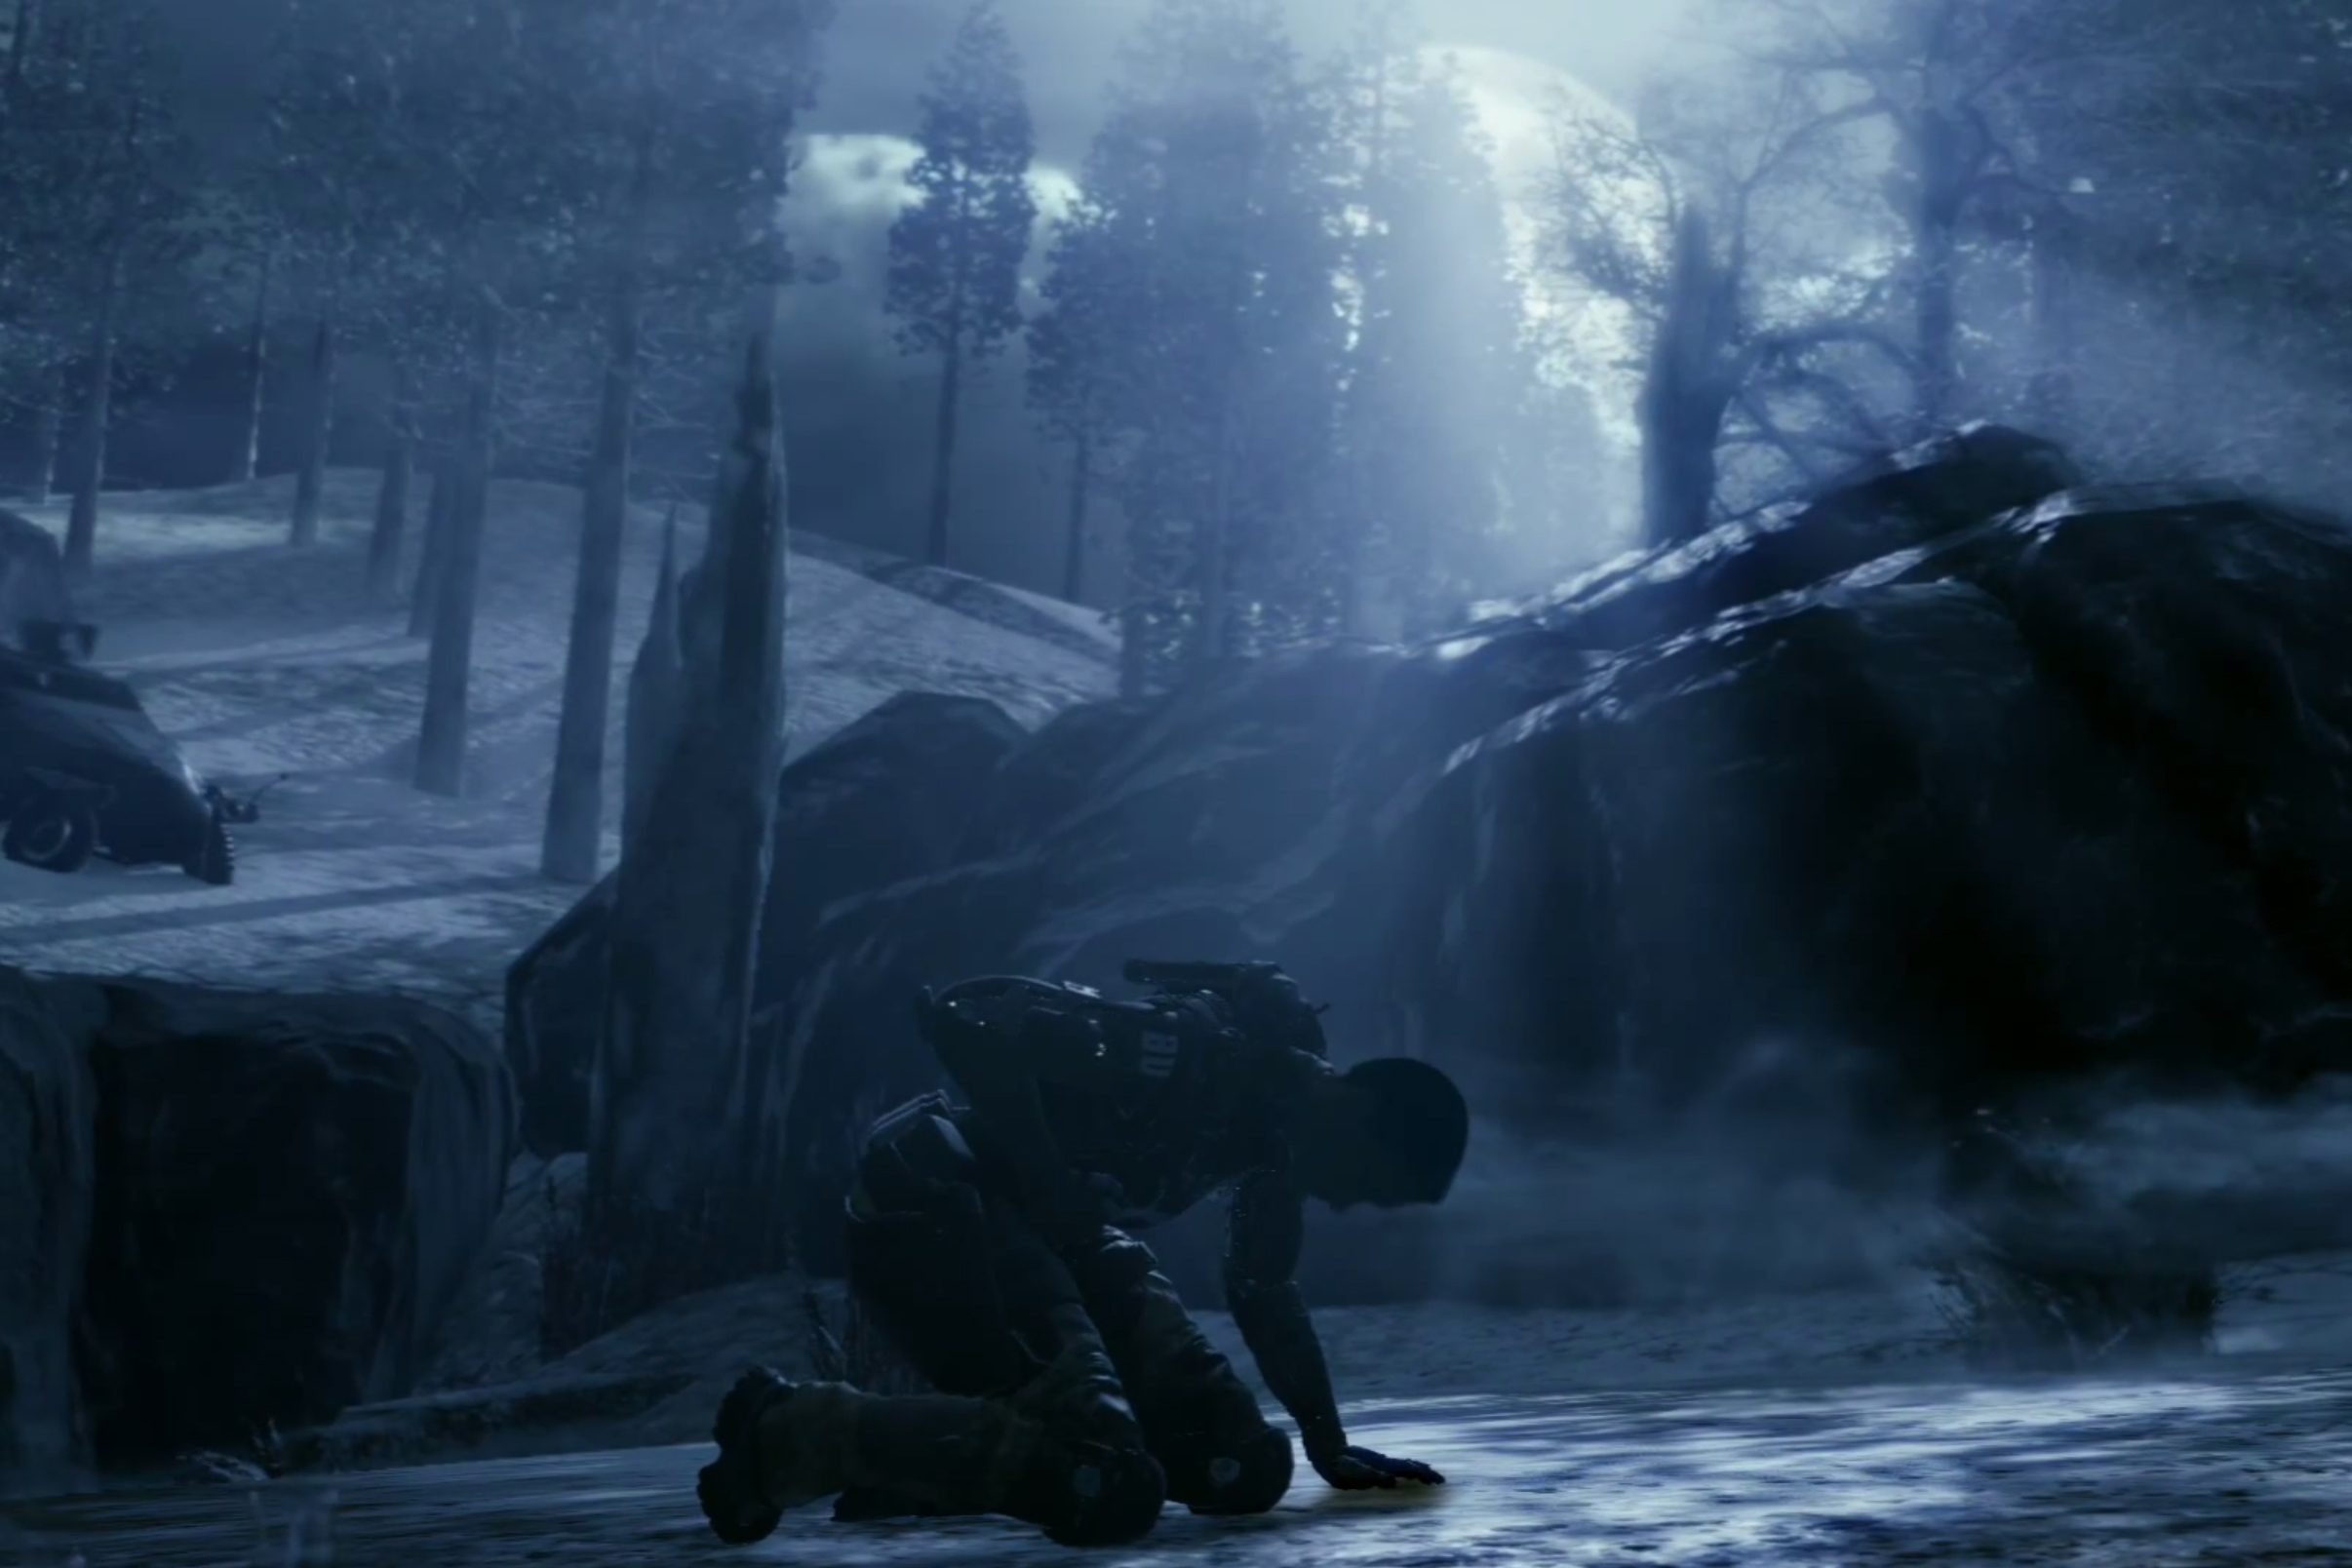 'Call of Duty: Black Ops III' Reveal Trailer